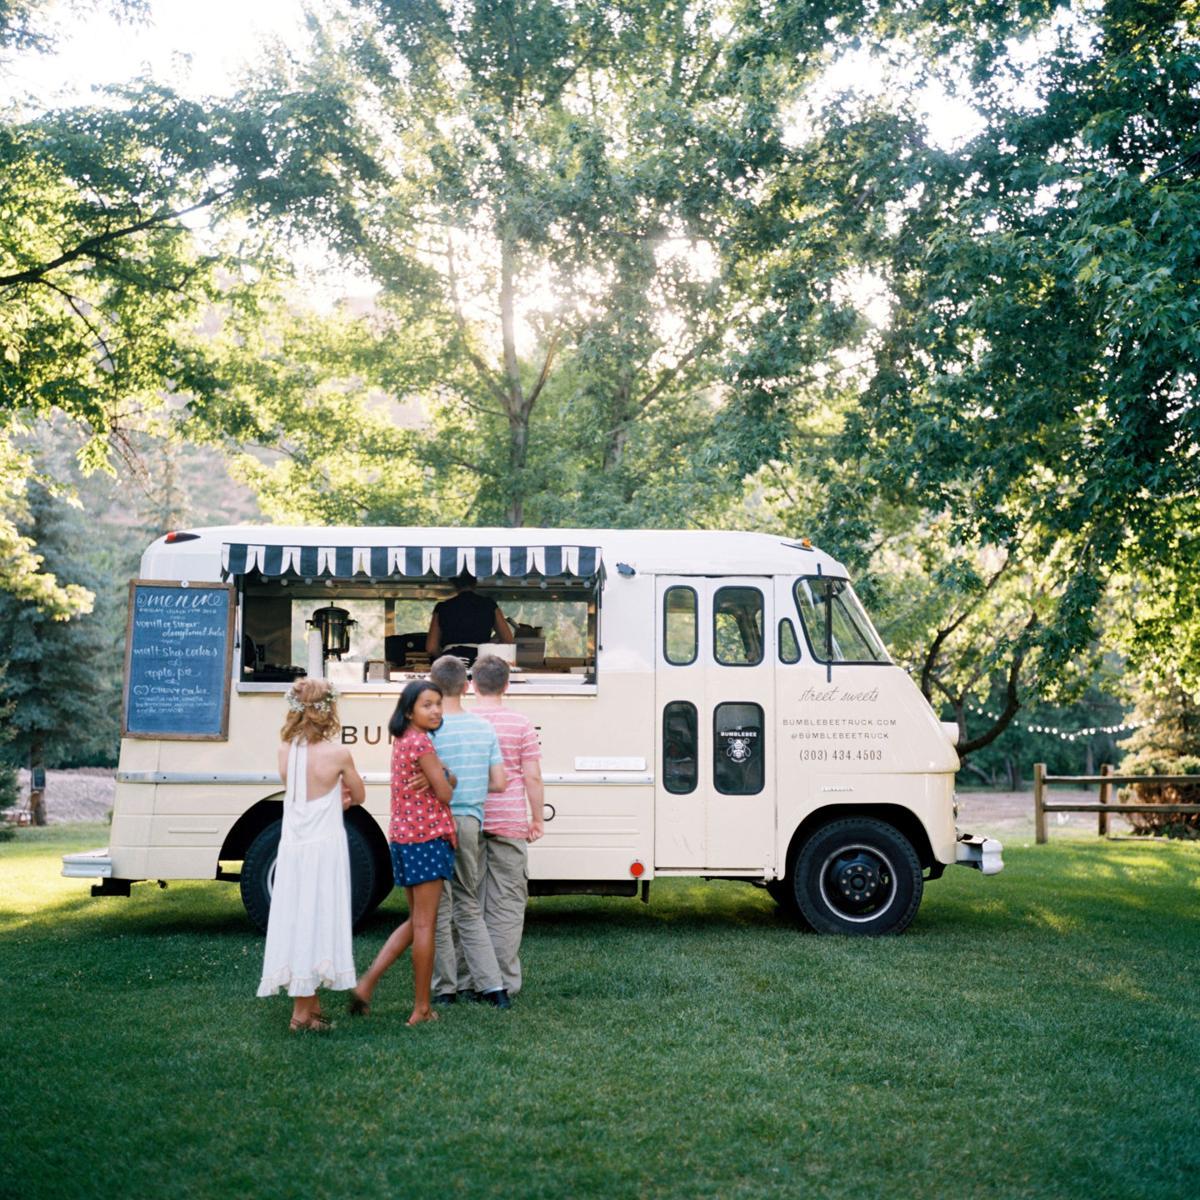 Houston Wedding Showcase: Planning A Wedding? Say 'I Do' To Food Trucks